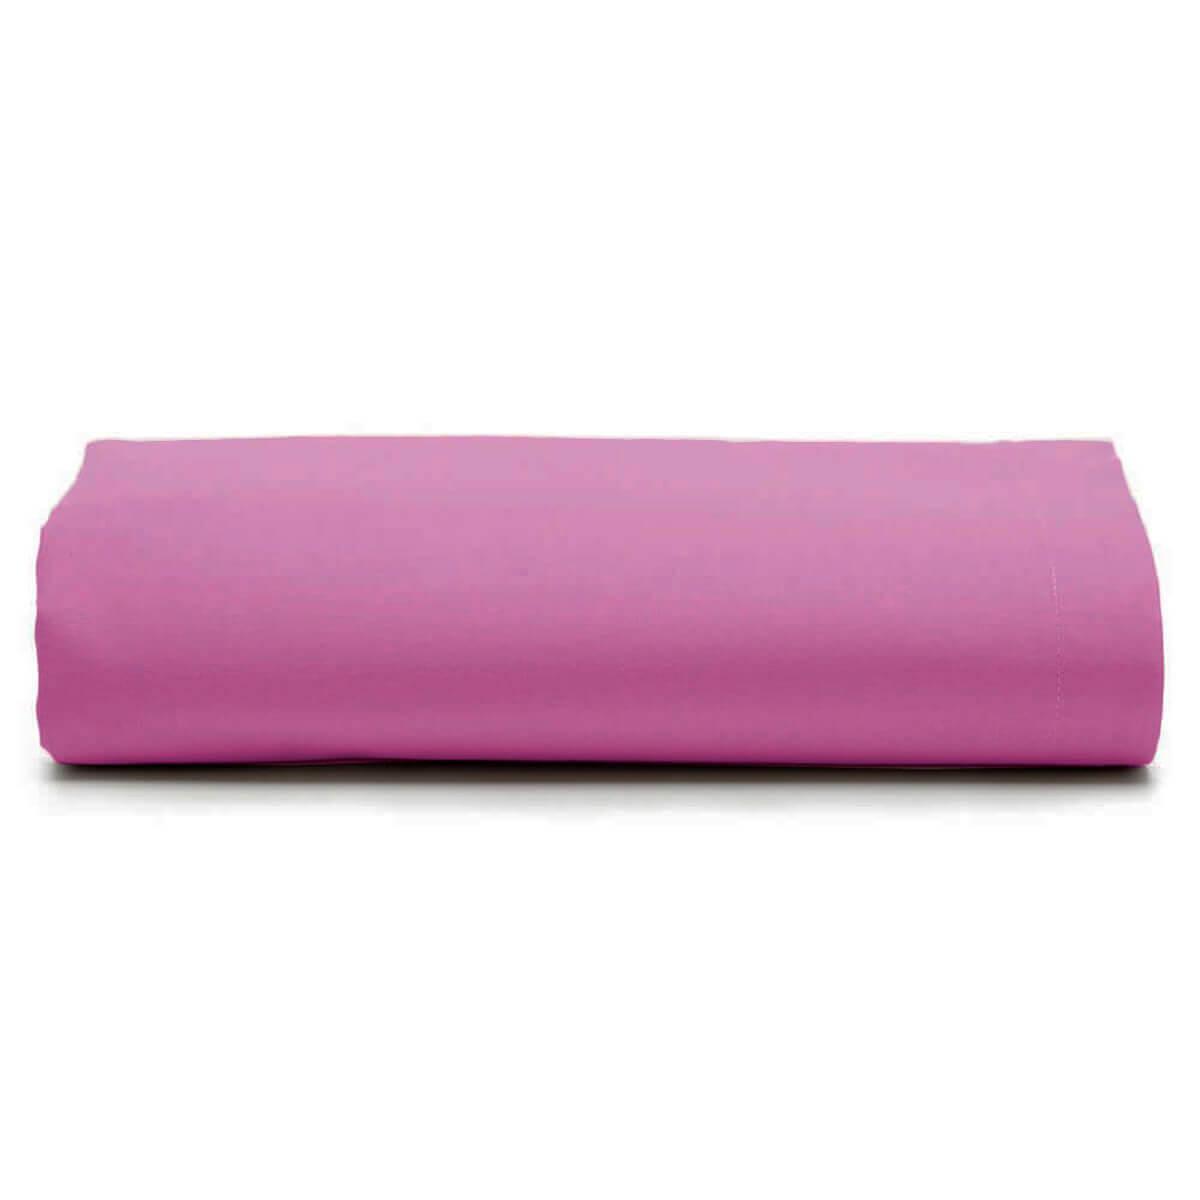 Lençol King Avulso 100% Algodão Royal Liso Pink